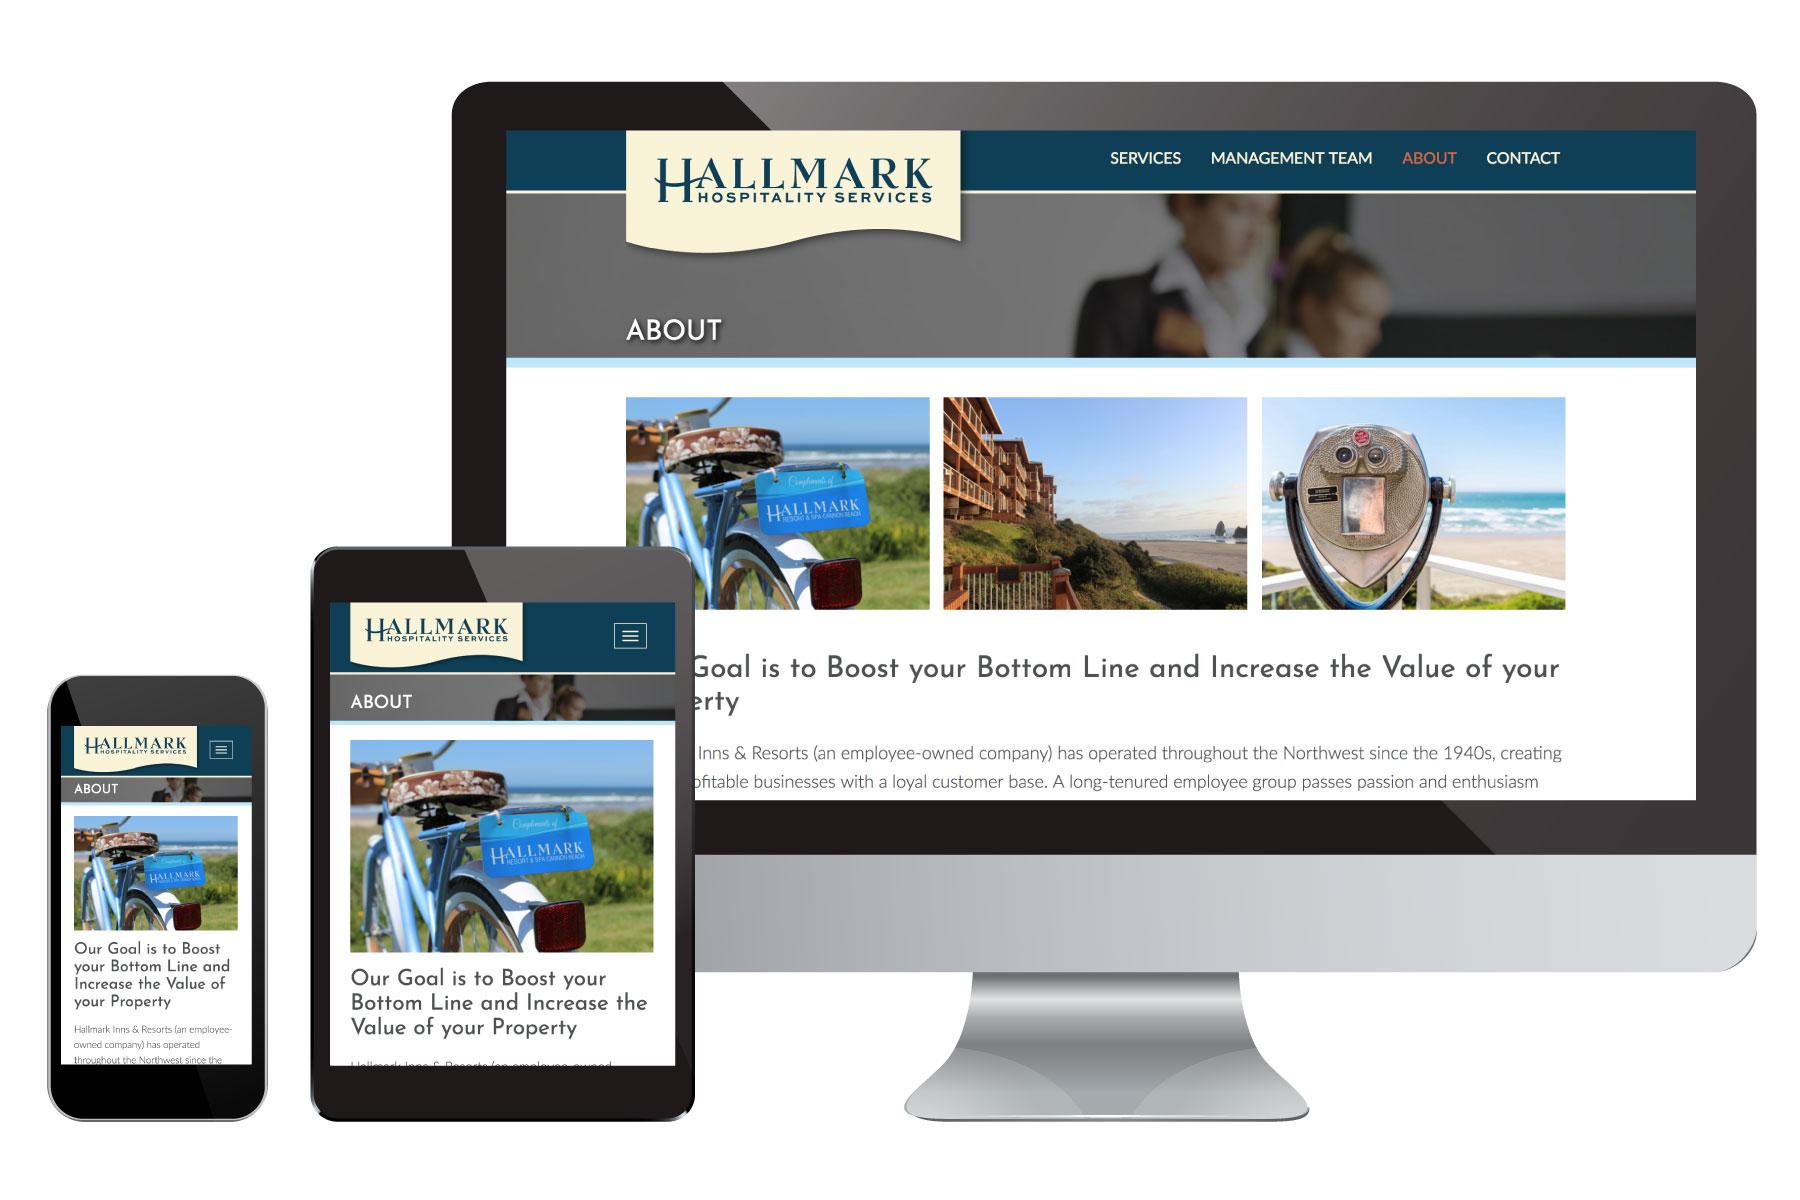 hallmark_website